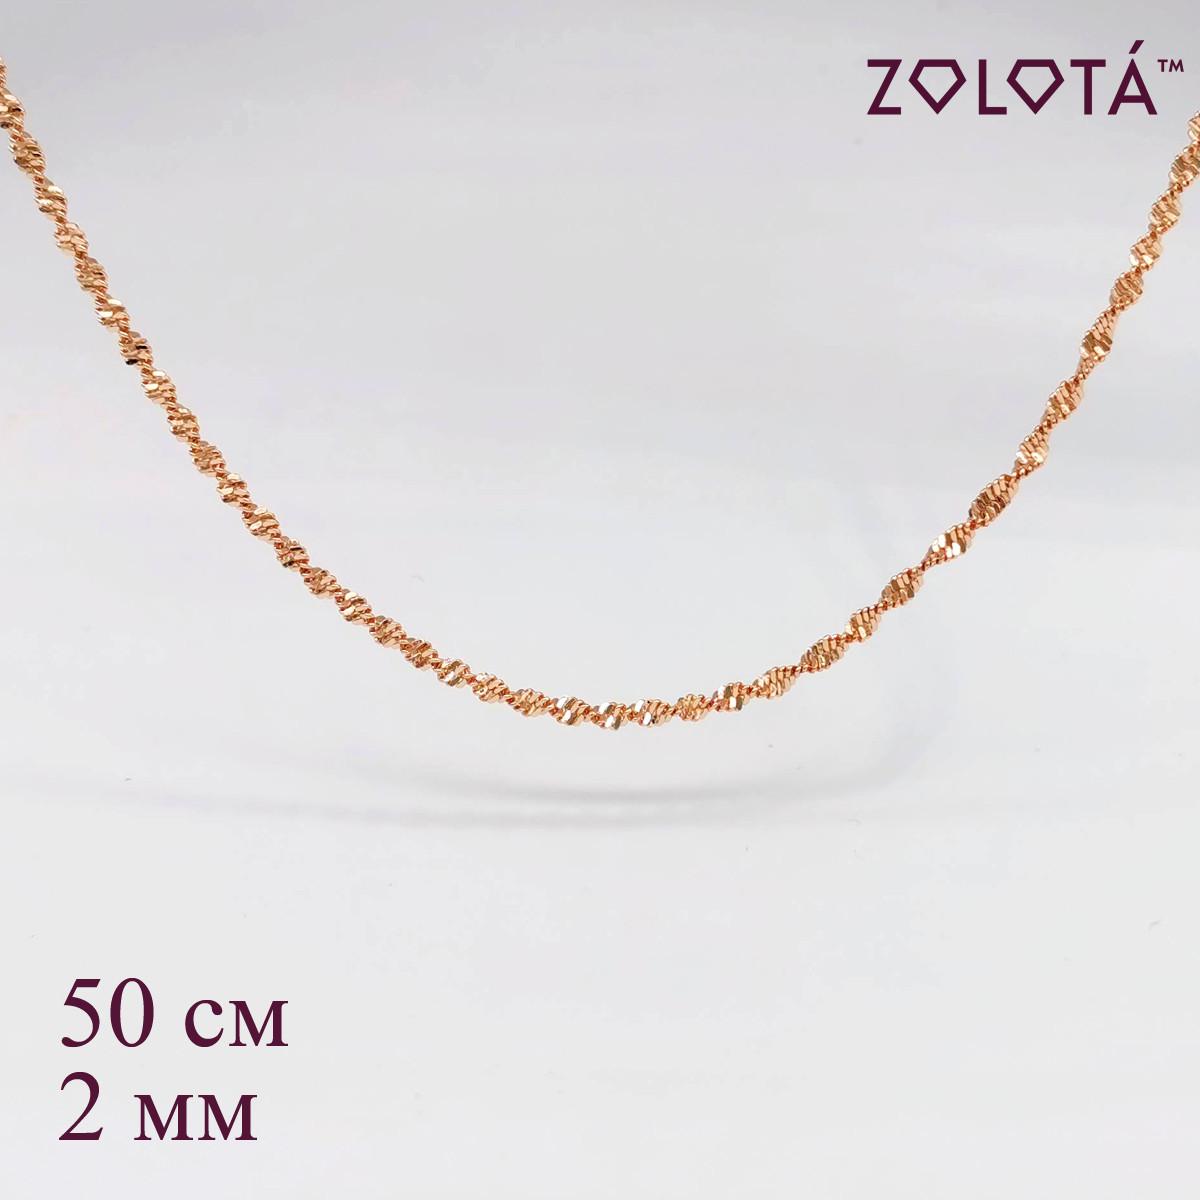 "Цепочка ""Снейк крученый"", длина 50 см, ширина 2 мм, вес 4 г, позолота РО, ЗЛ01243 (50 см)"